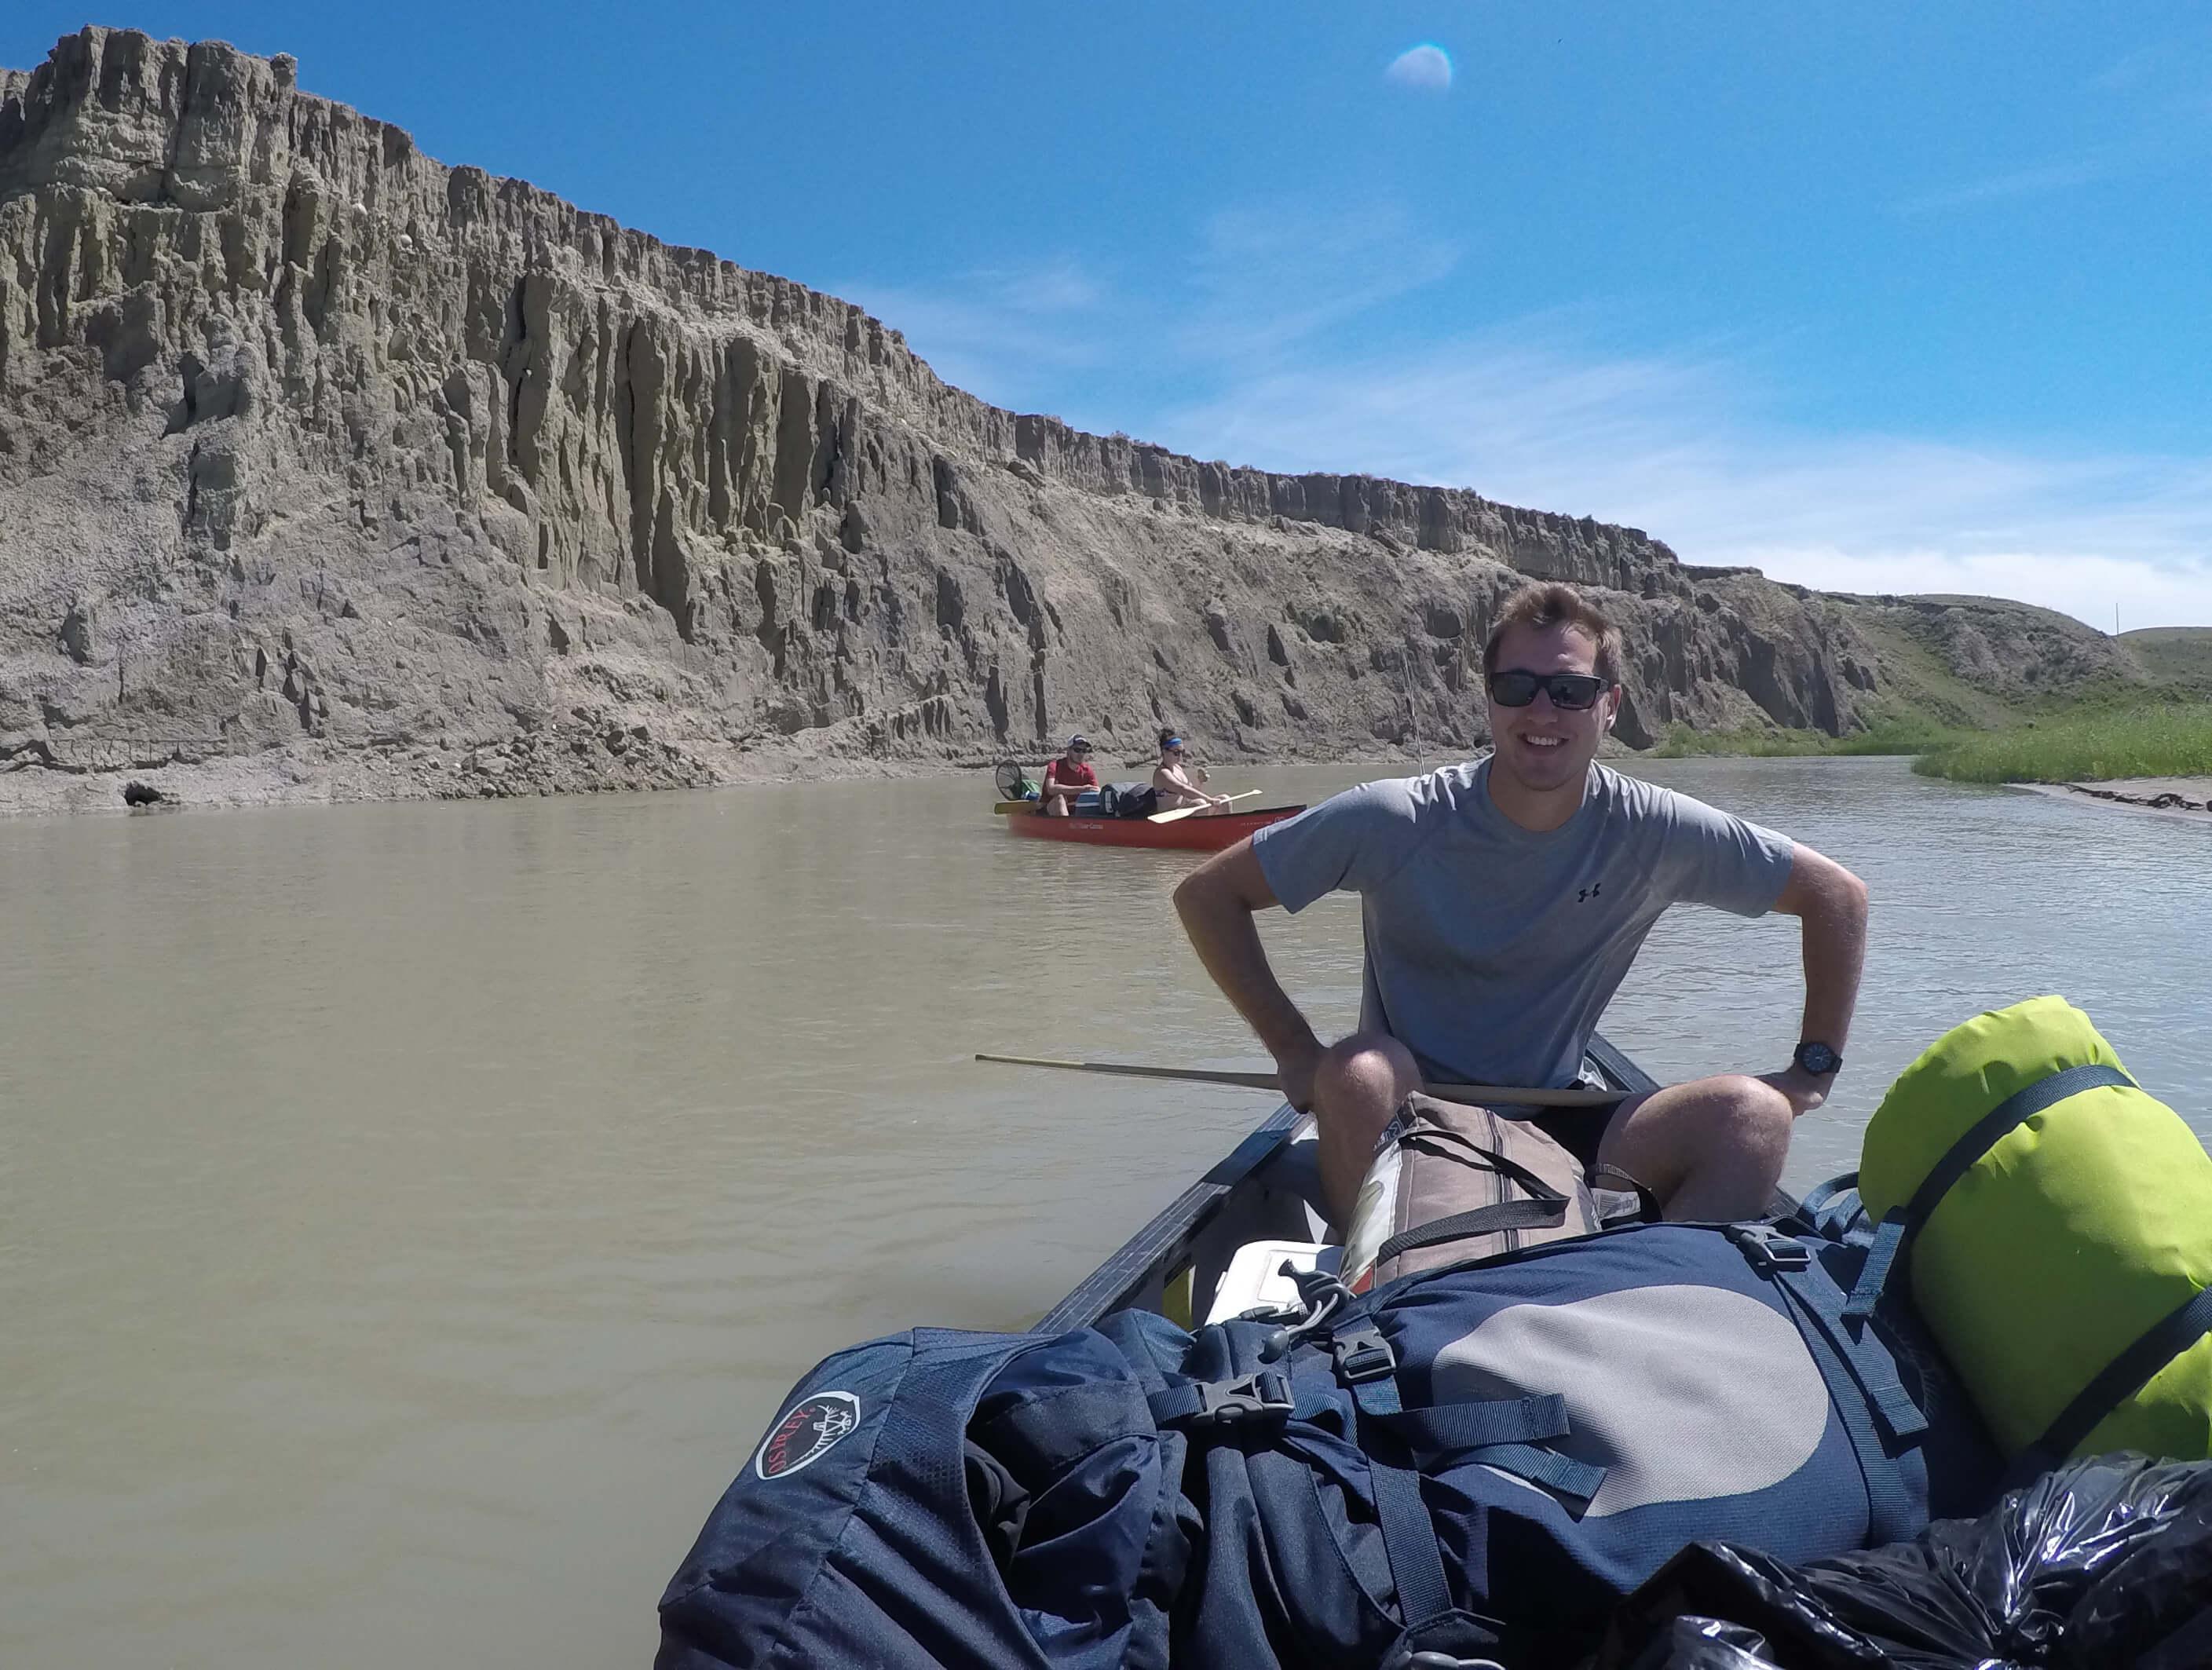 Mat Vercaigne on a kayak